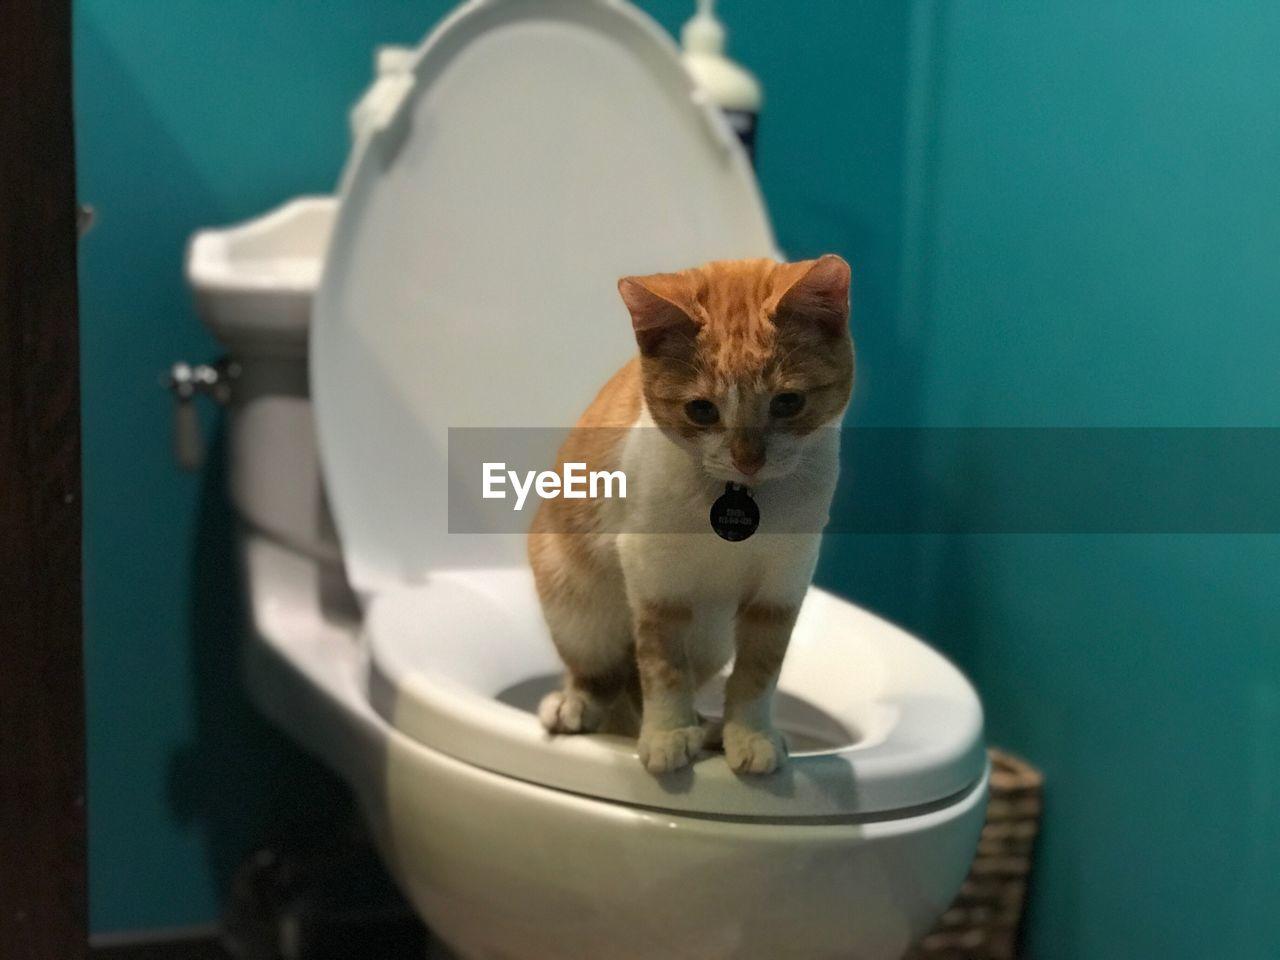 Cat sitting on toilet bowl in bathroom